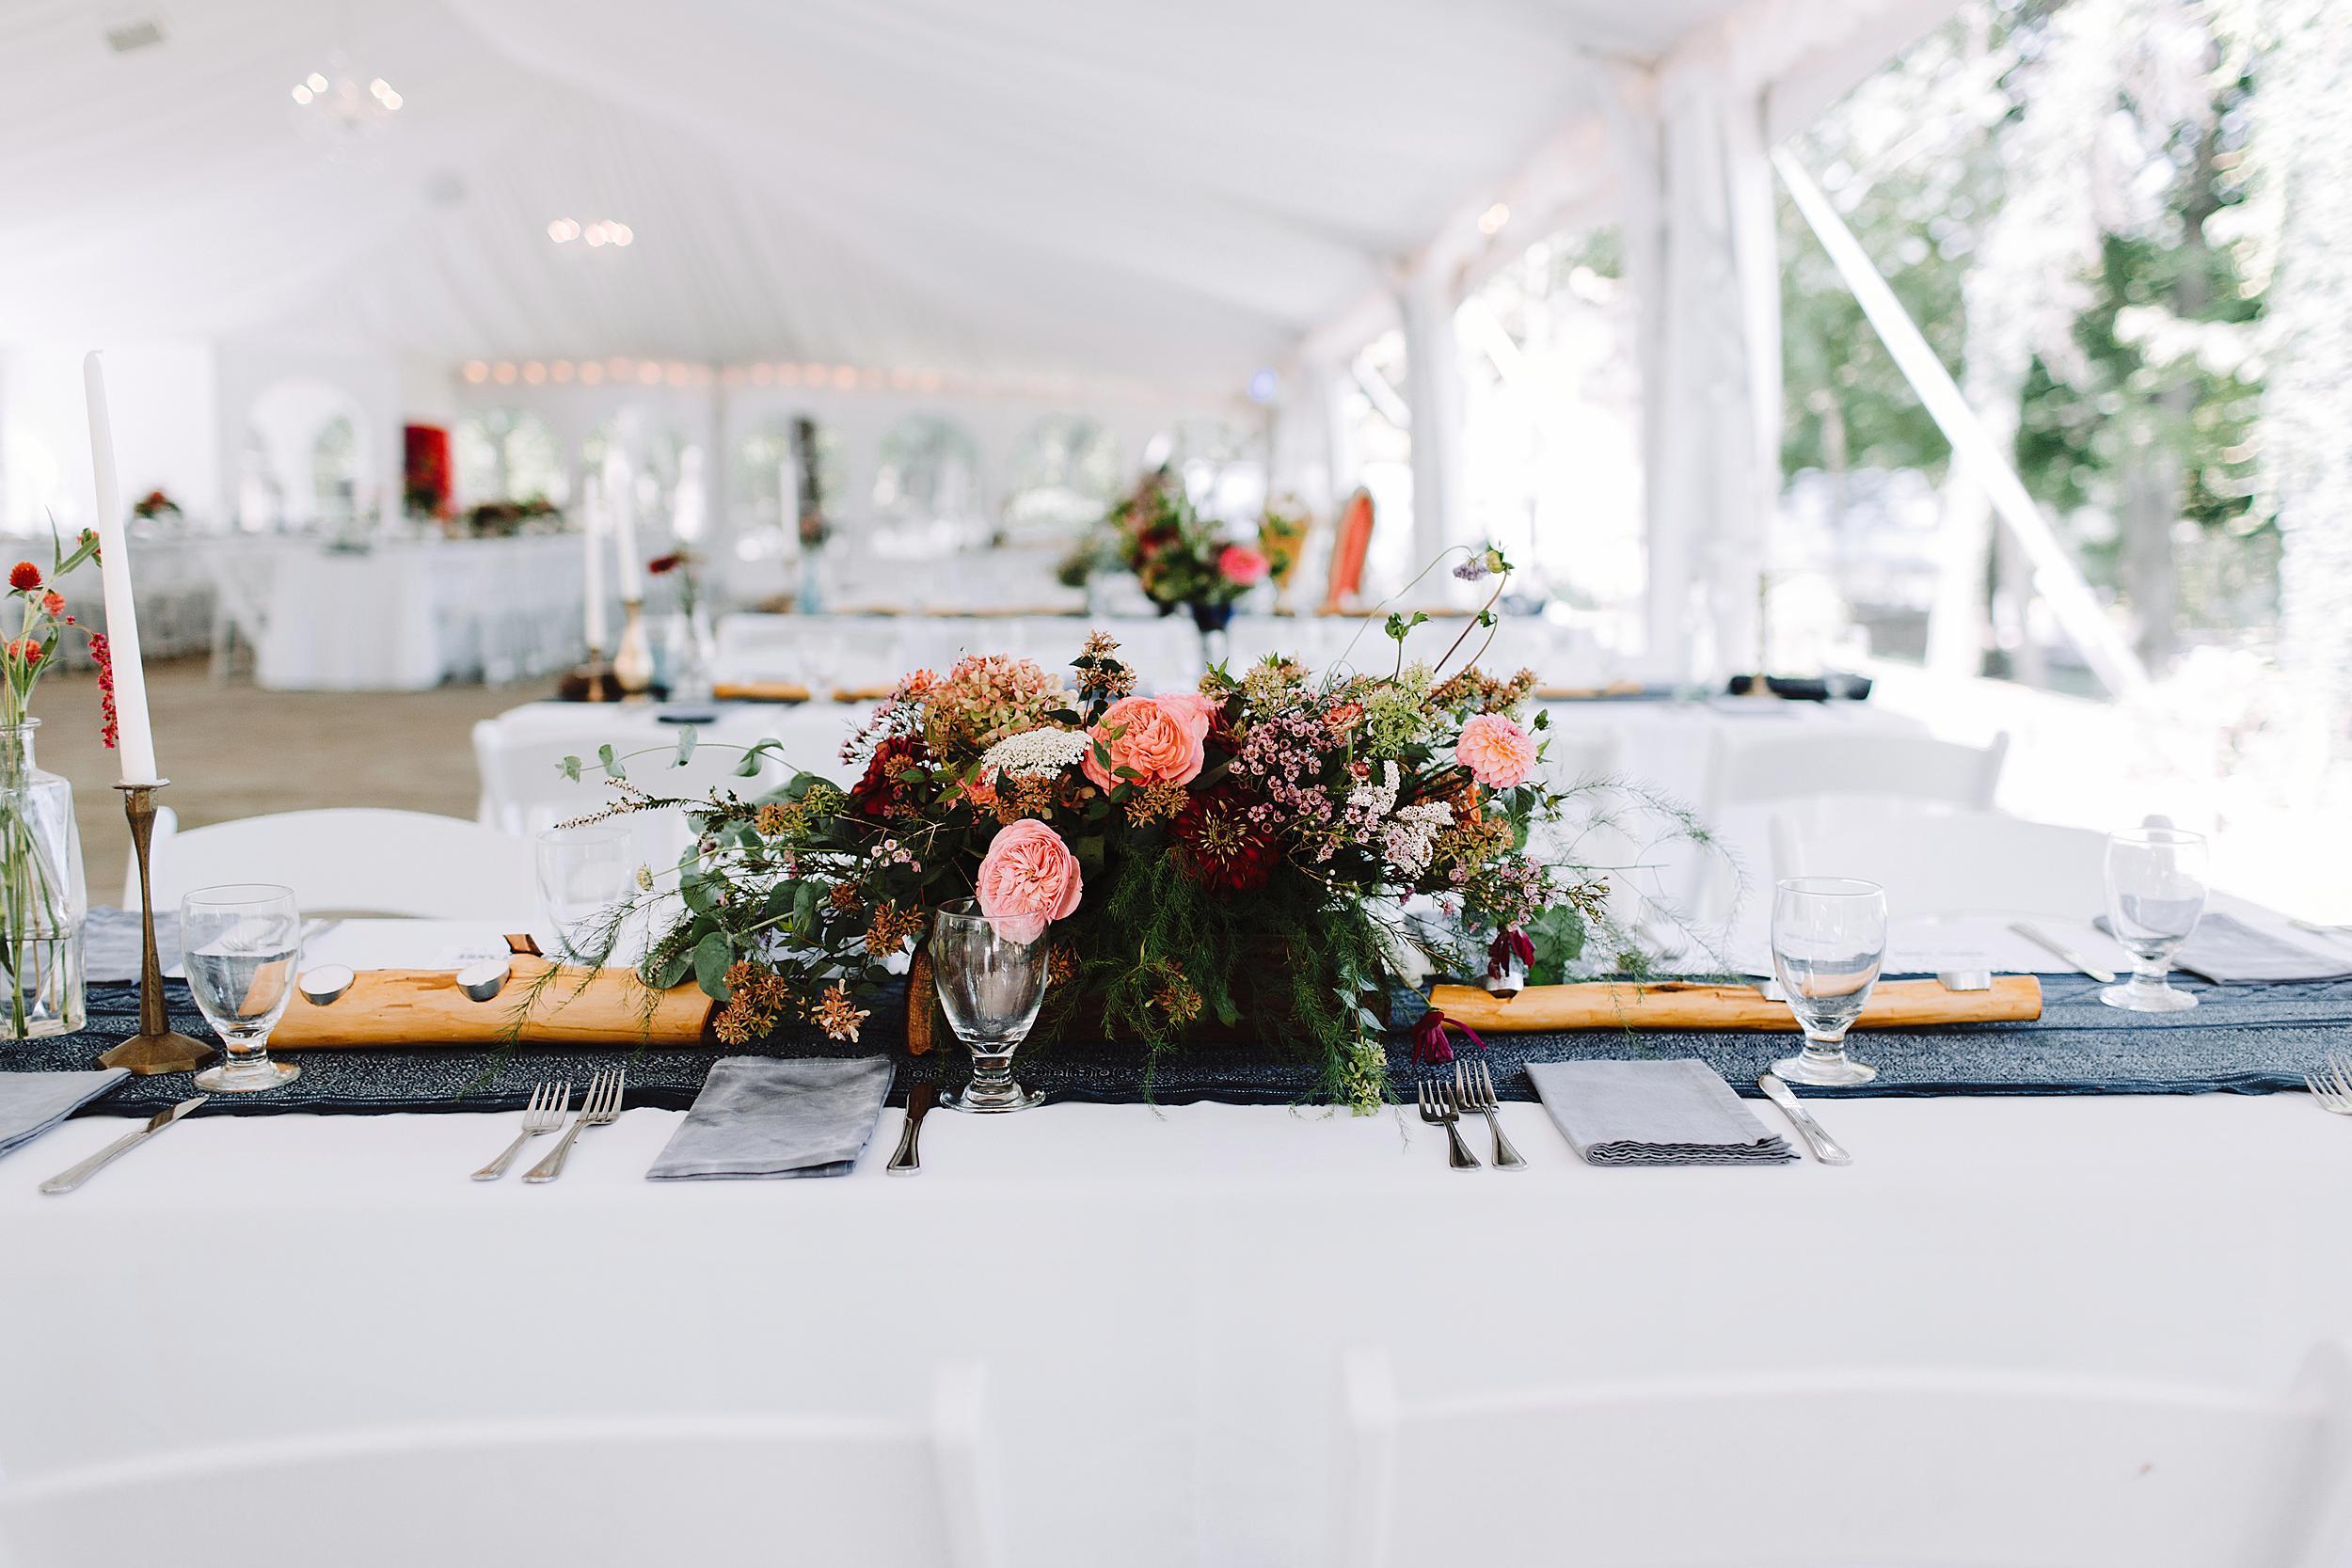 historic_shady_lane_wedding_with_love_and_embers-013.JPG